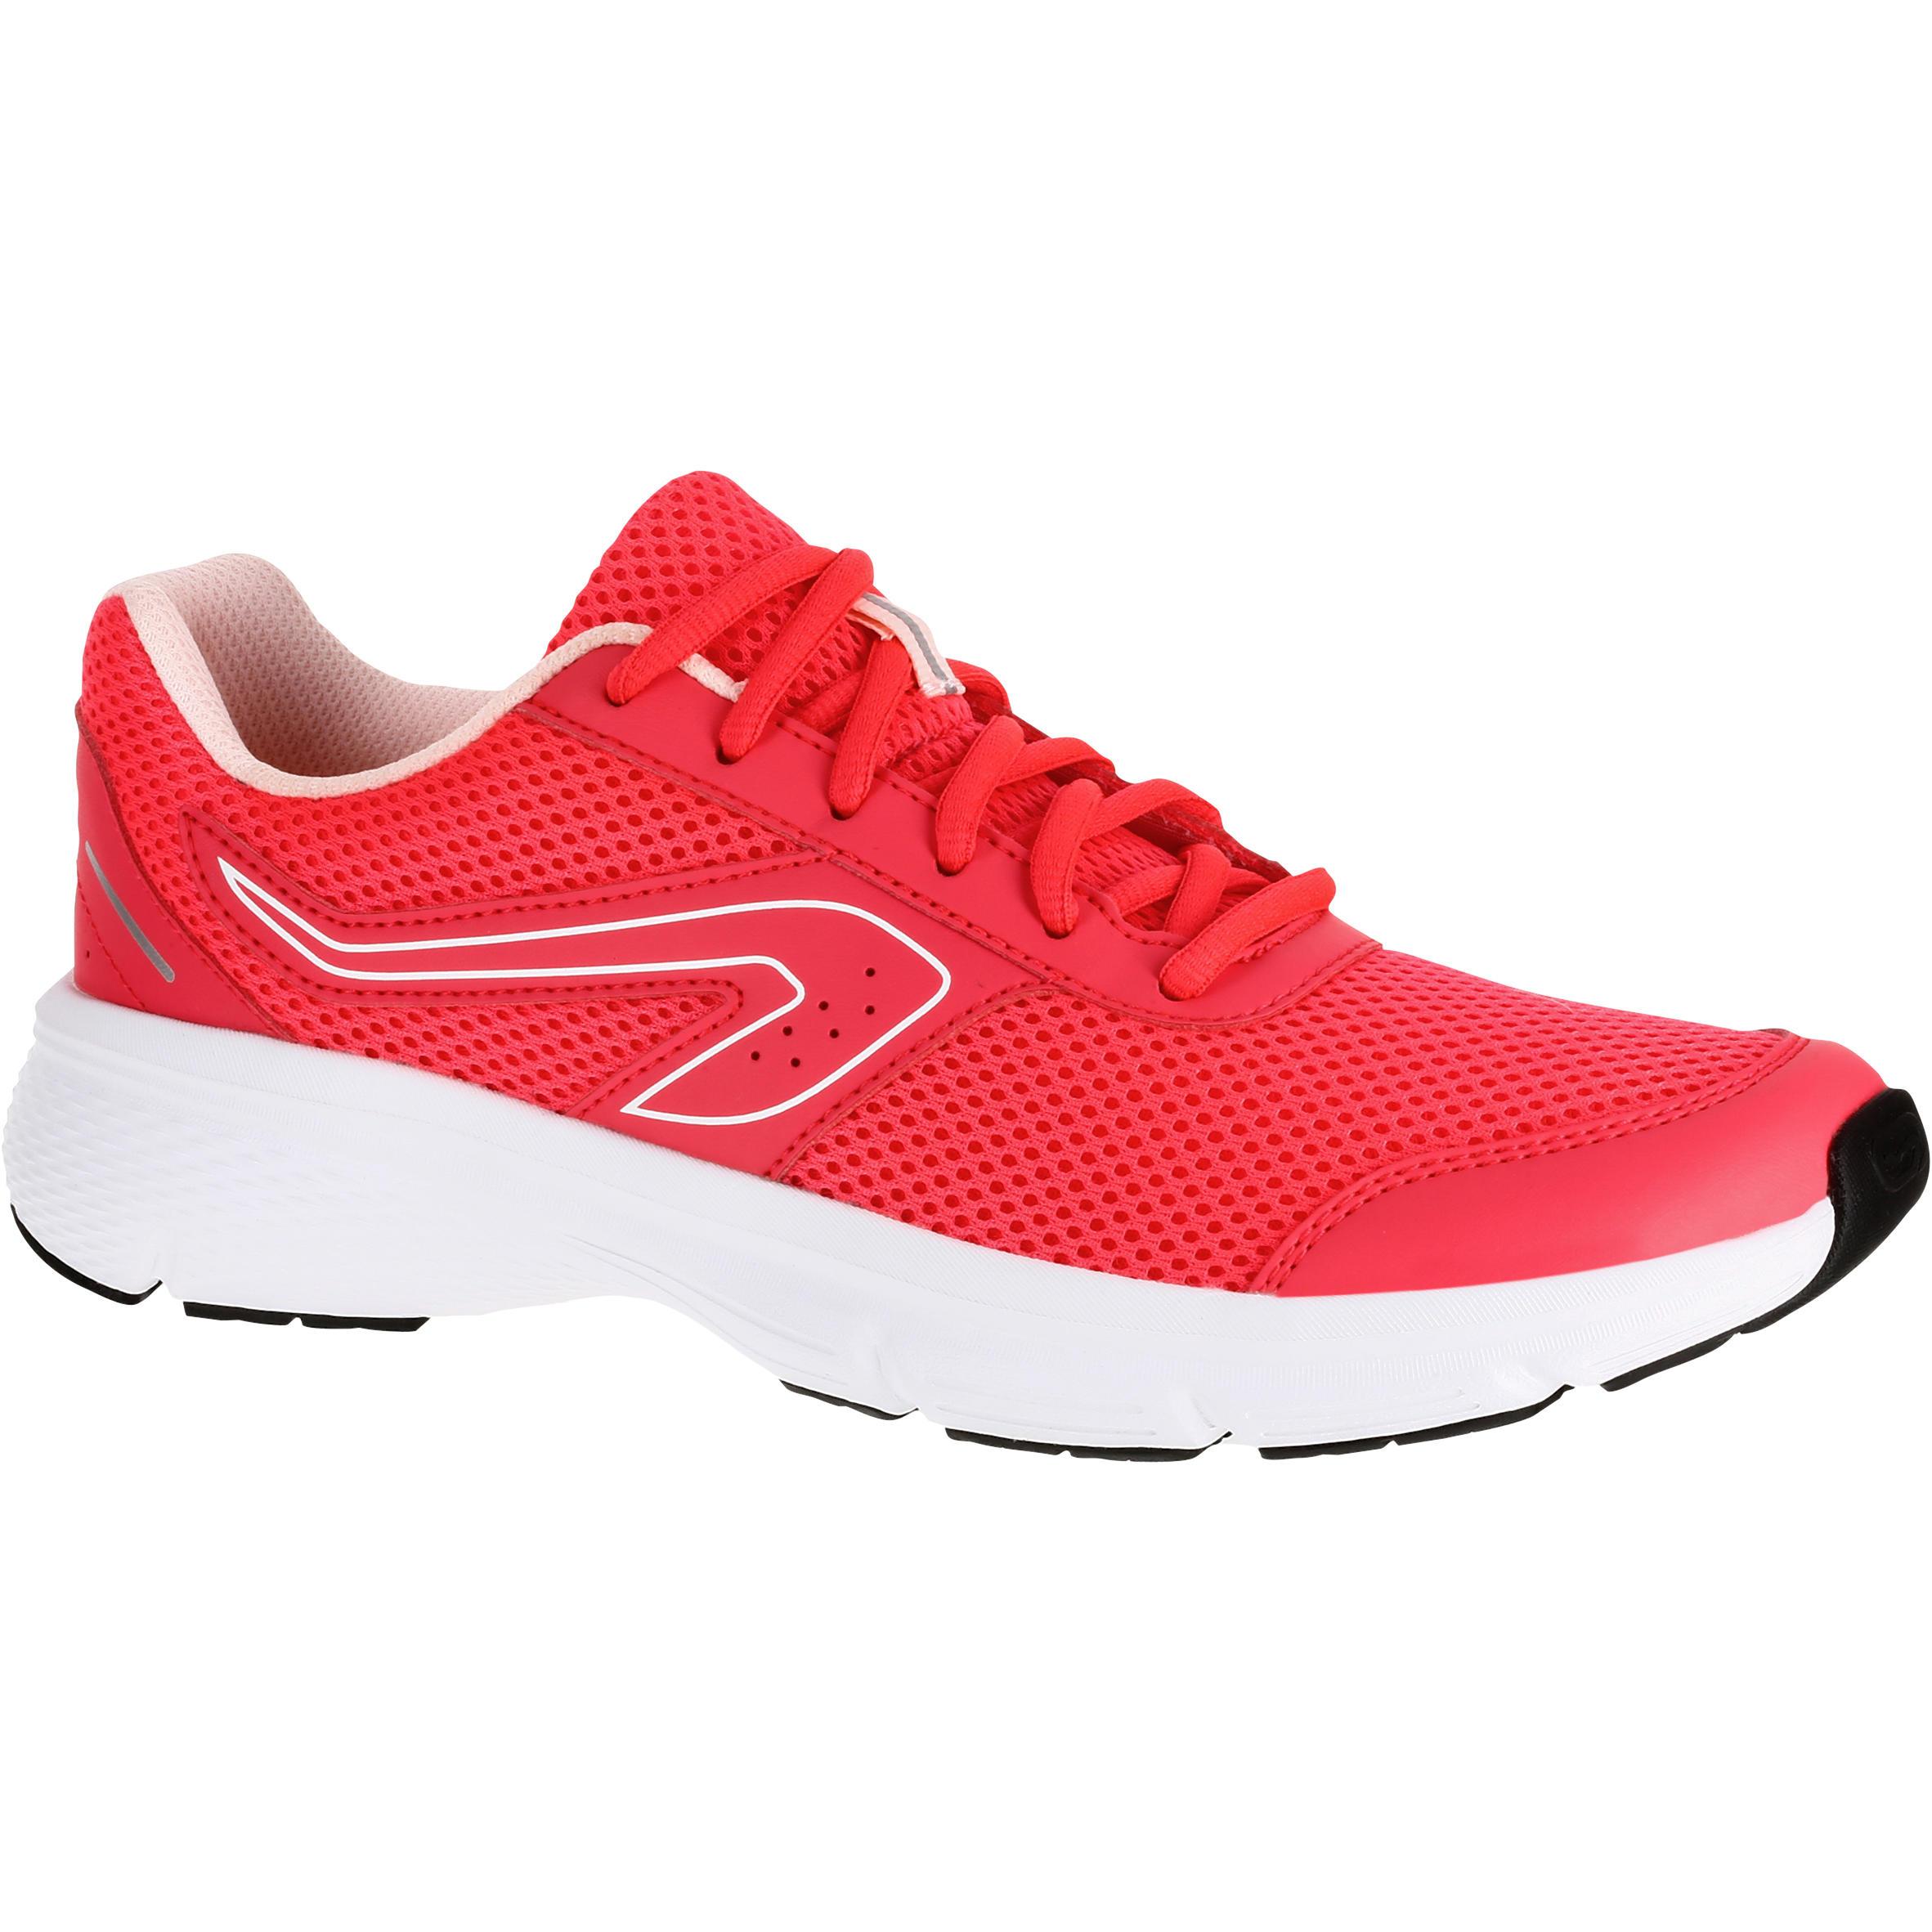 Run Cushion Women's Running Shoes - Coral